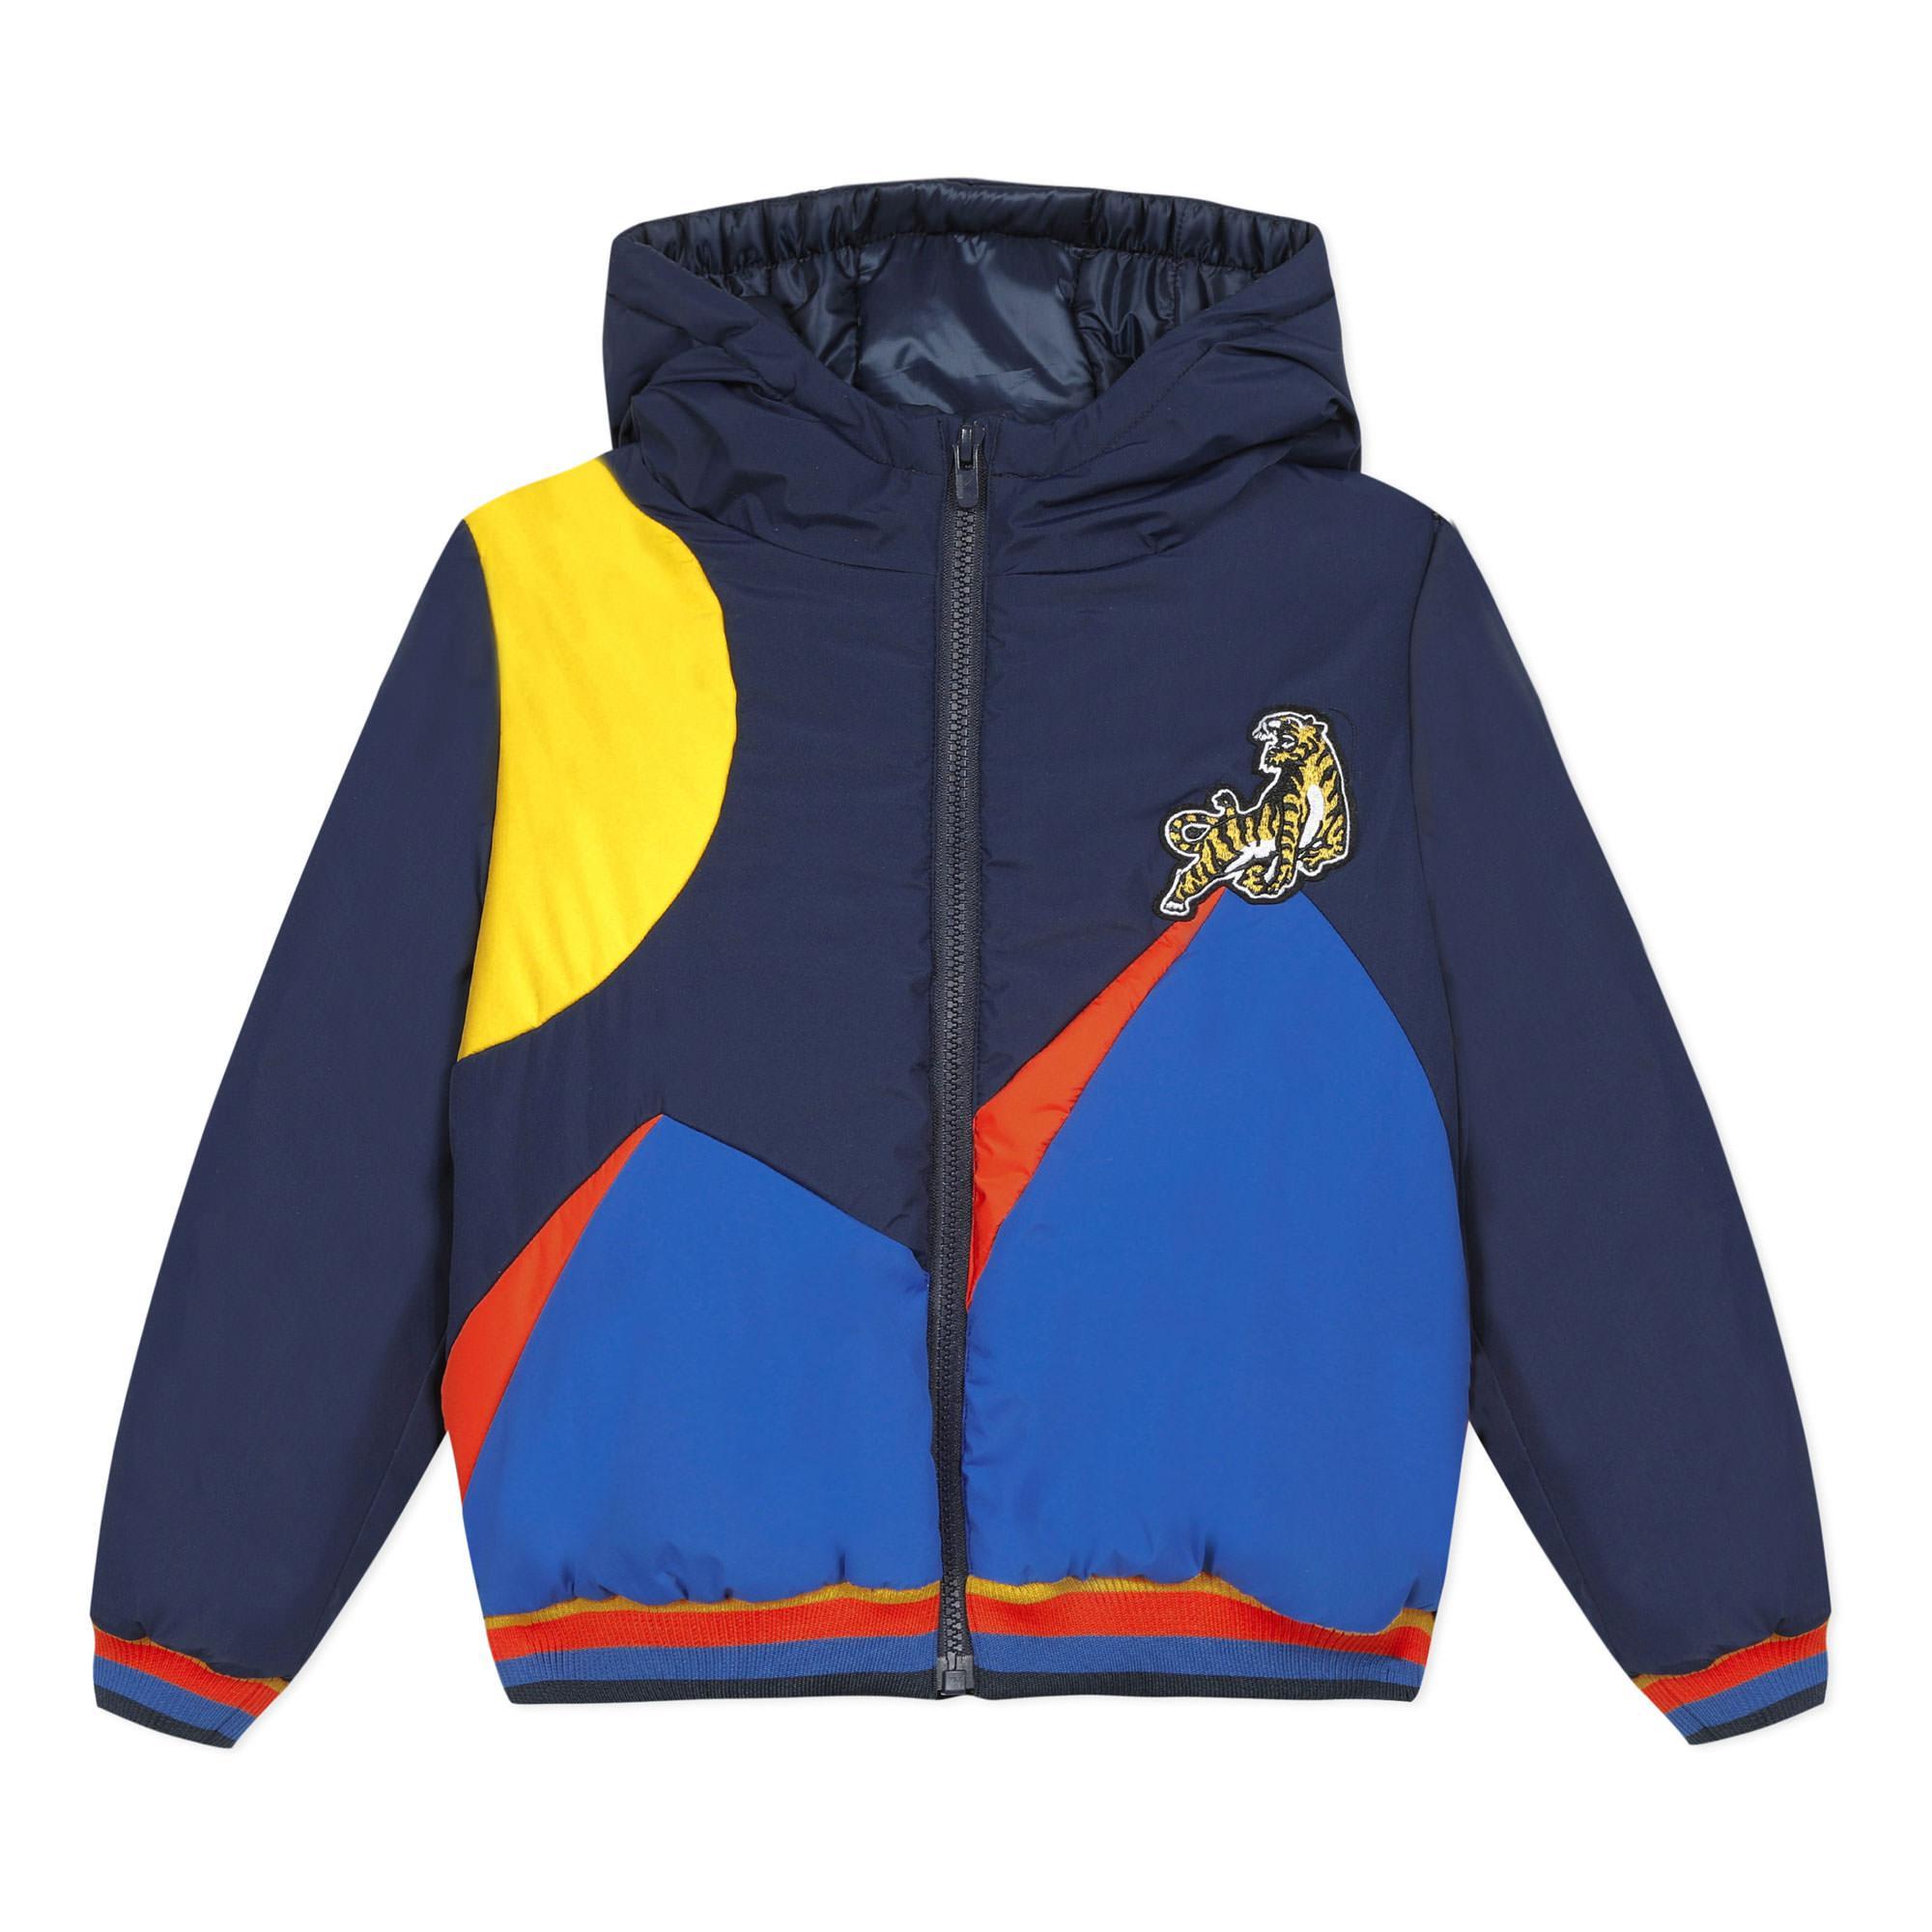 Tiger Detail Jacket